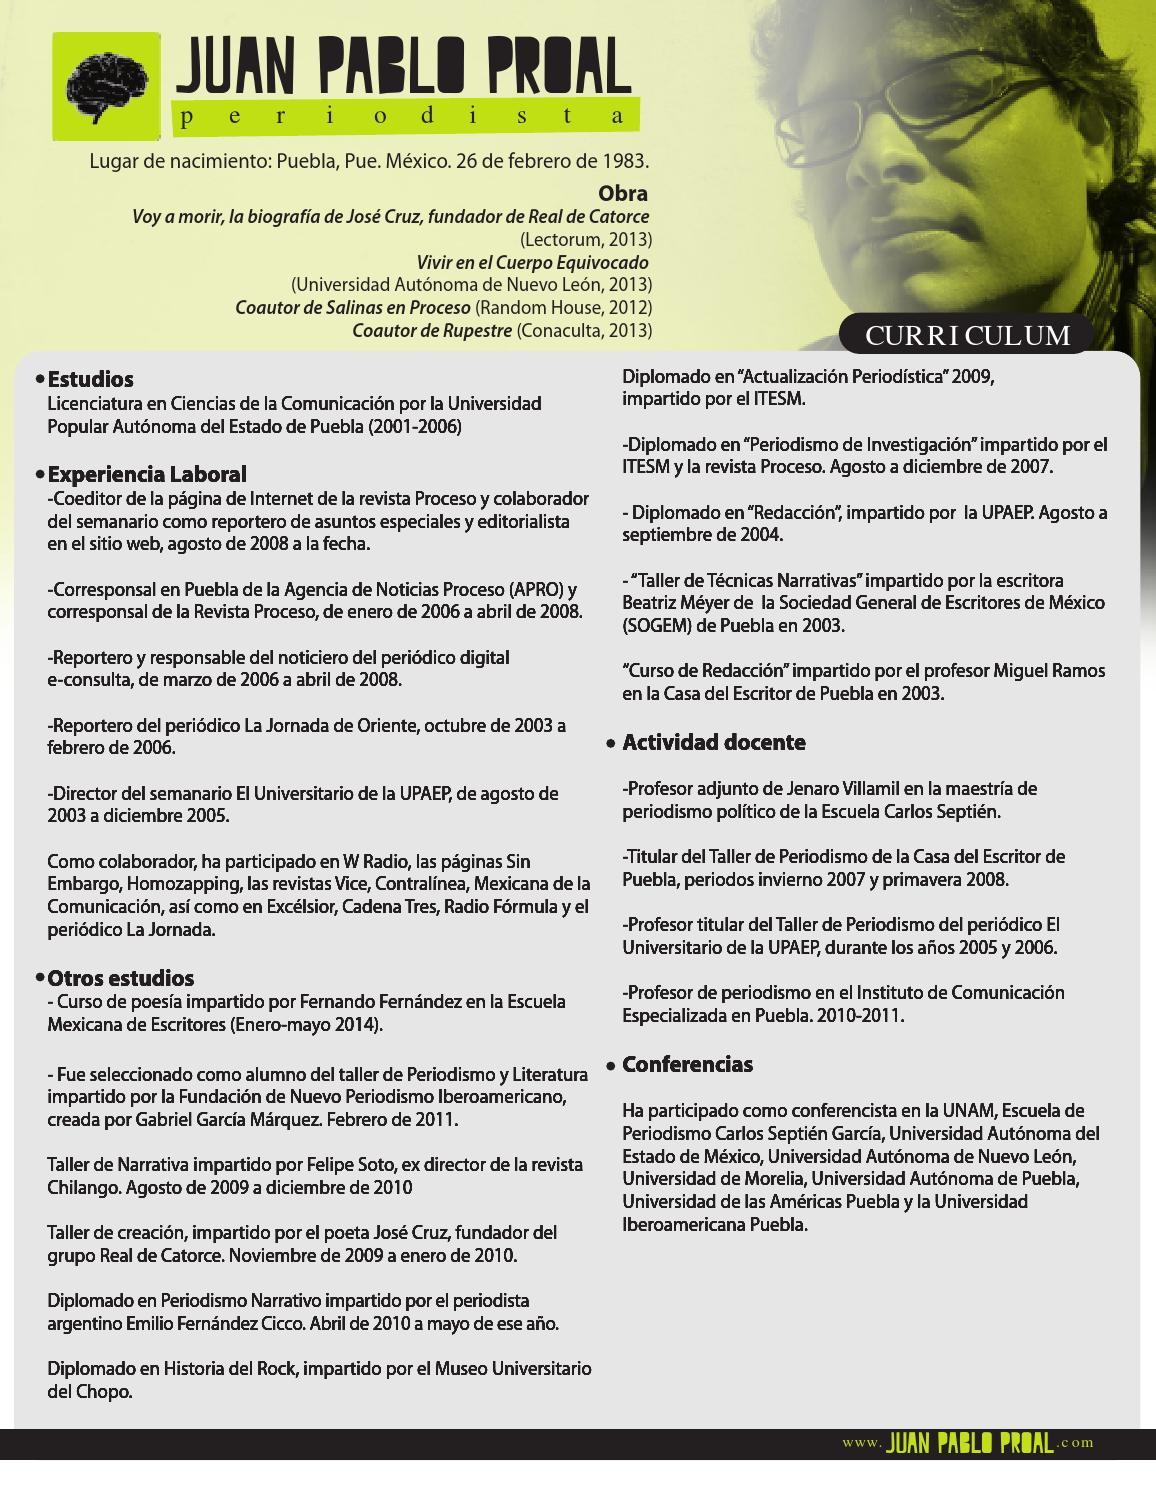 Curriculum Juan Pablo Proal by Jorge Cruz - issuu